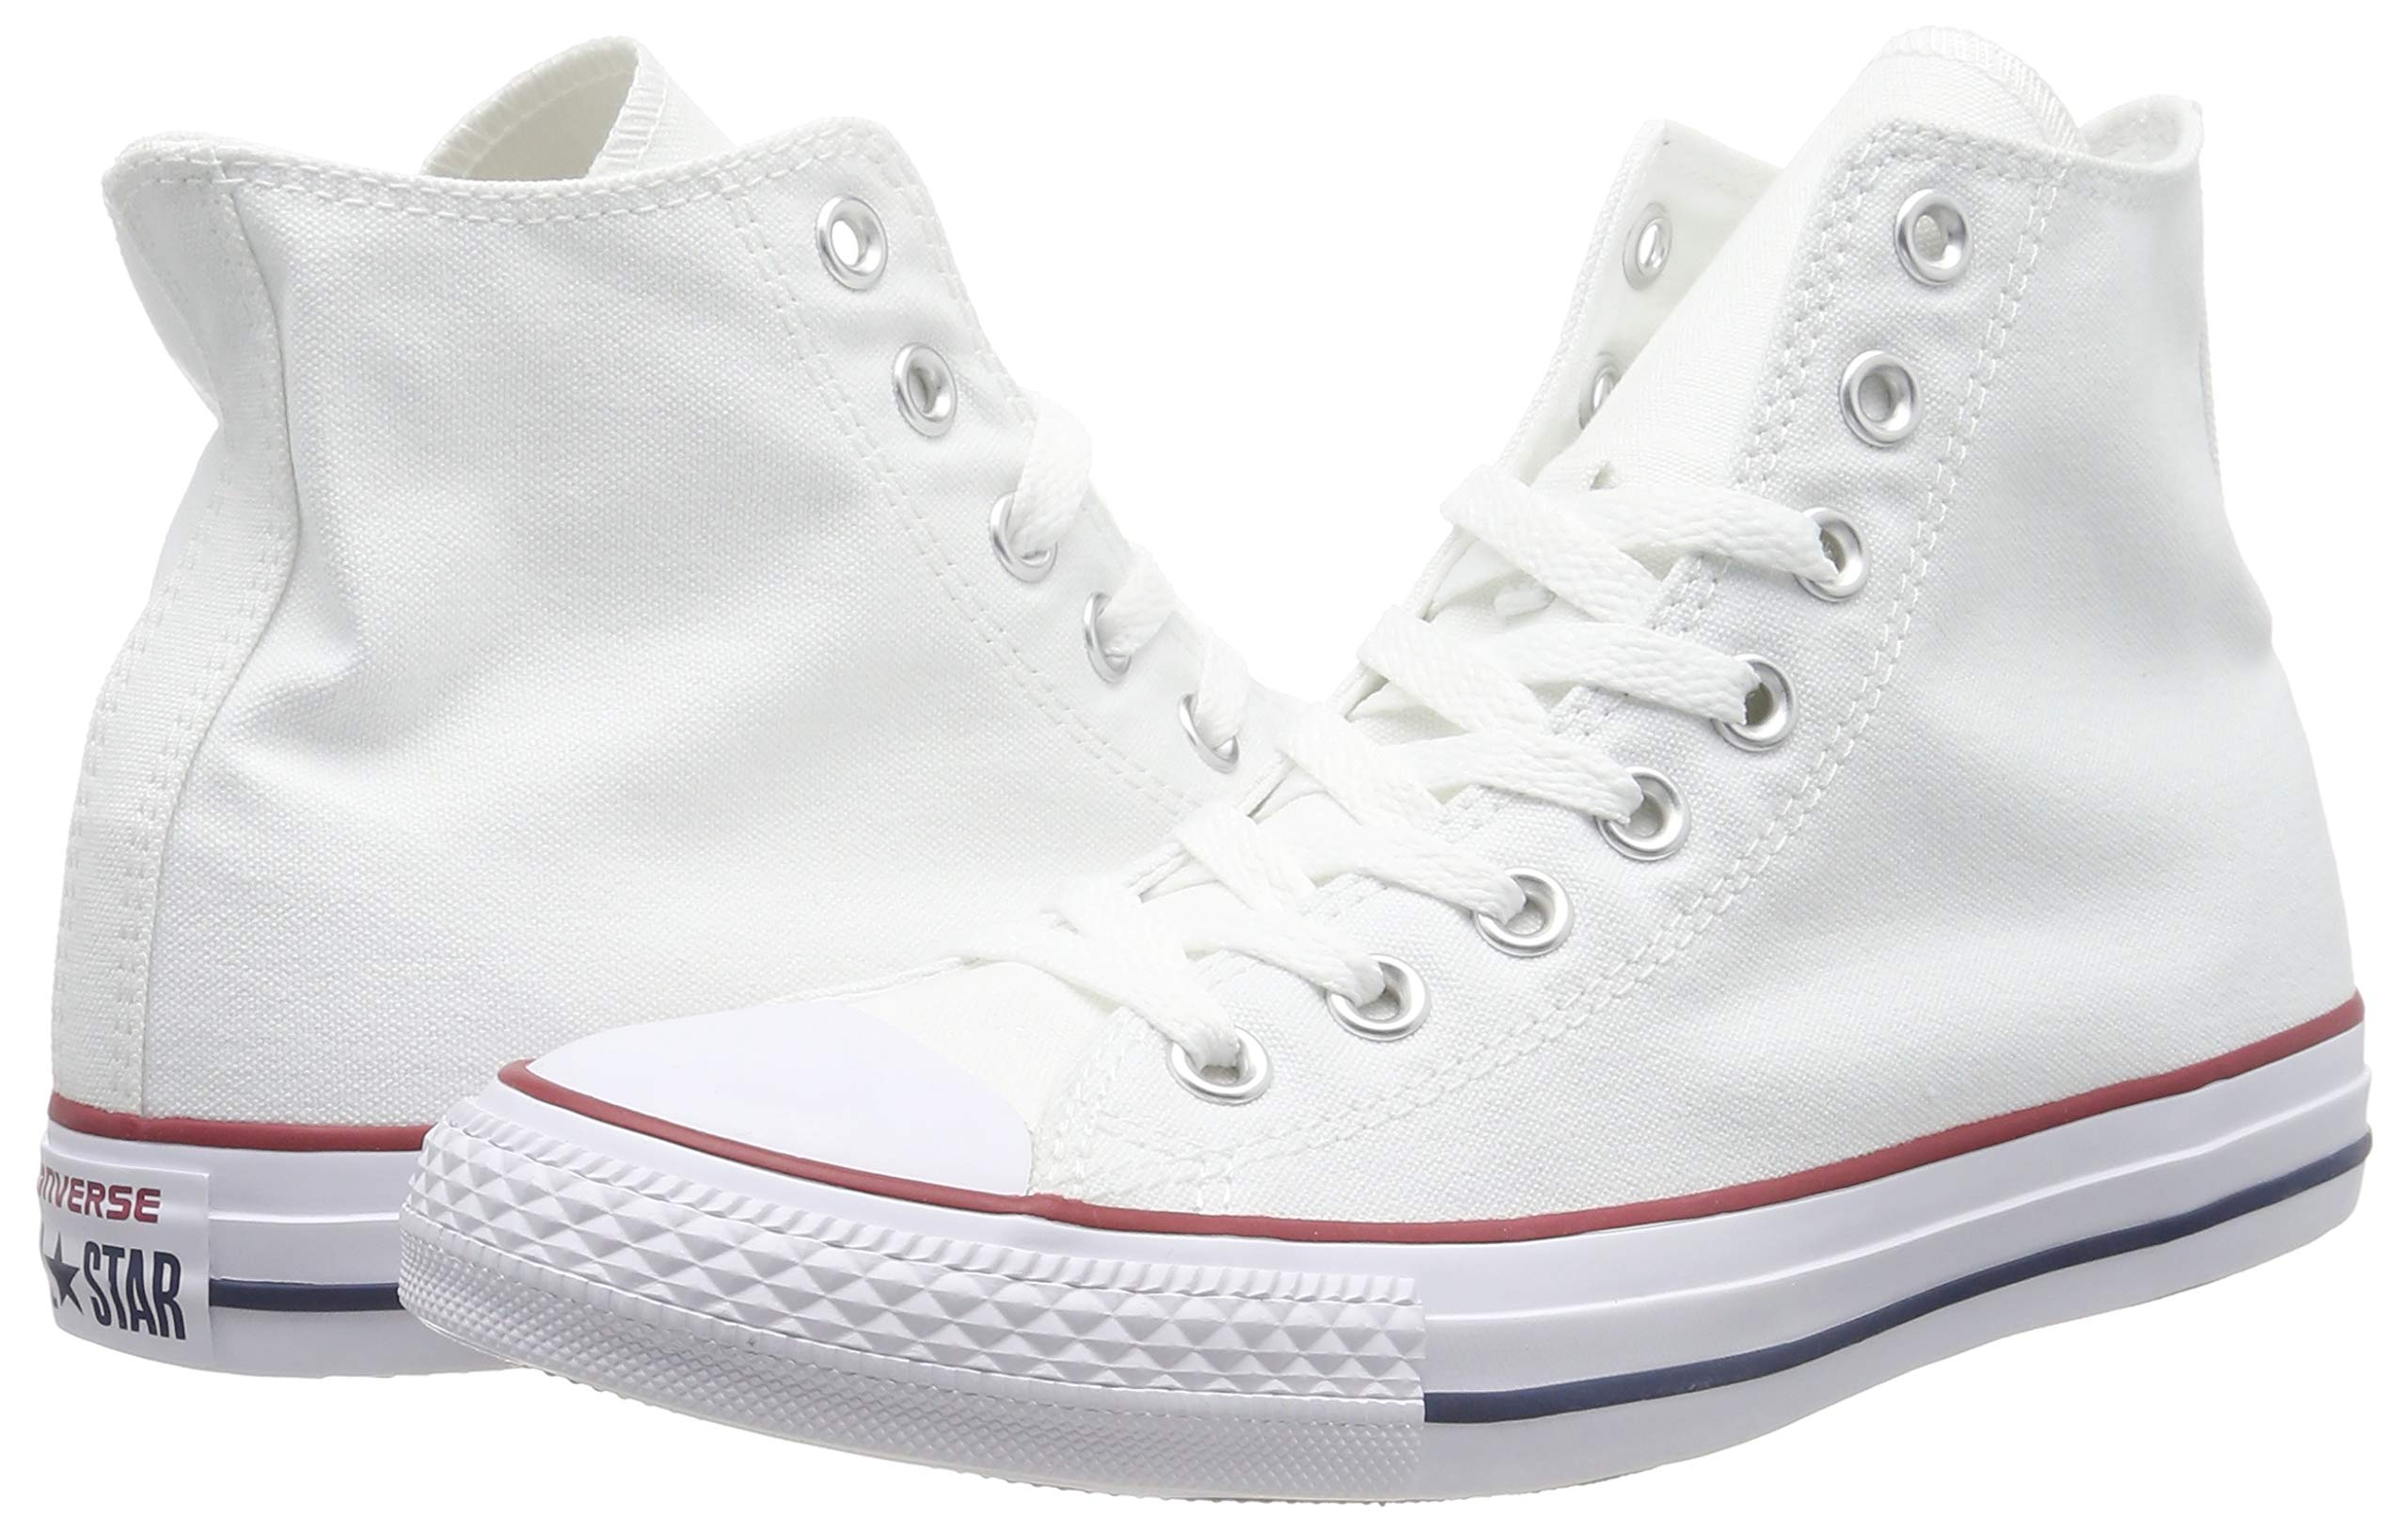 Converse Chuck Taylor All Star Canvas High Top,Optical White, 5.5 Women/3.5 Men